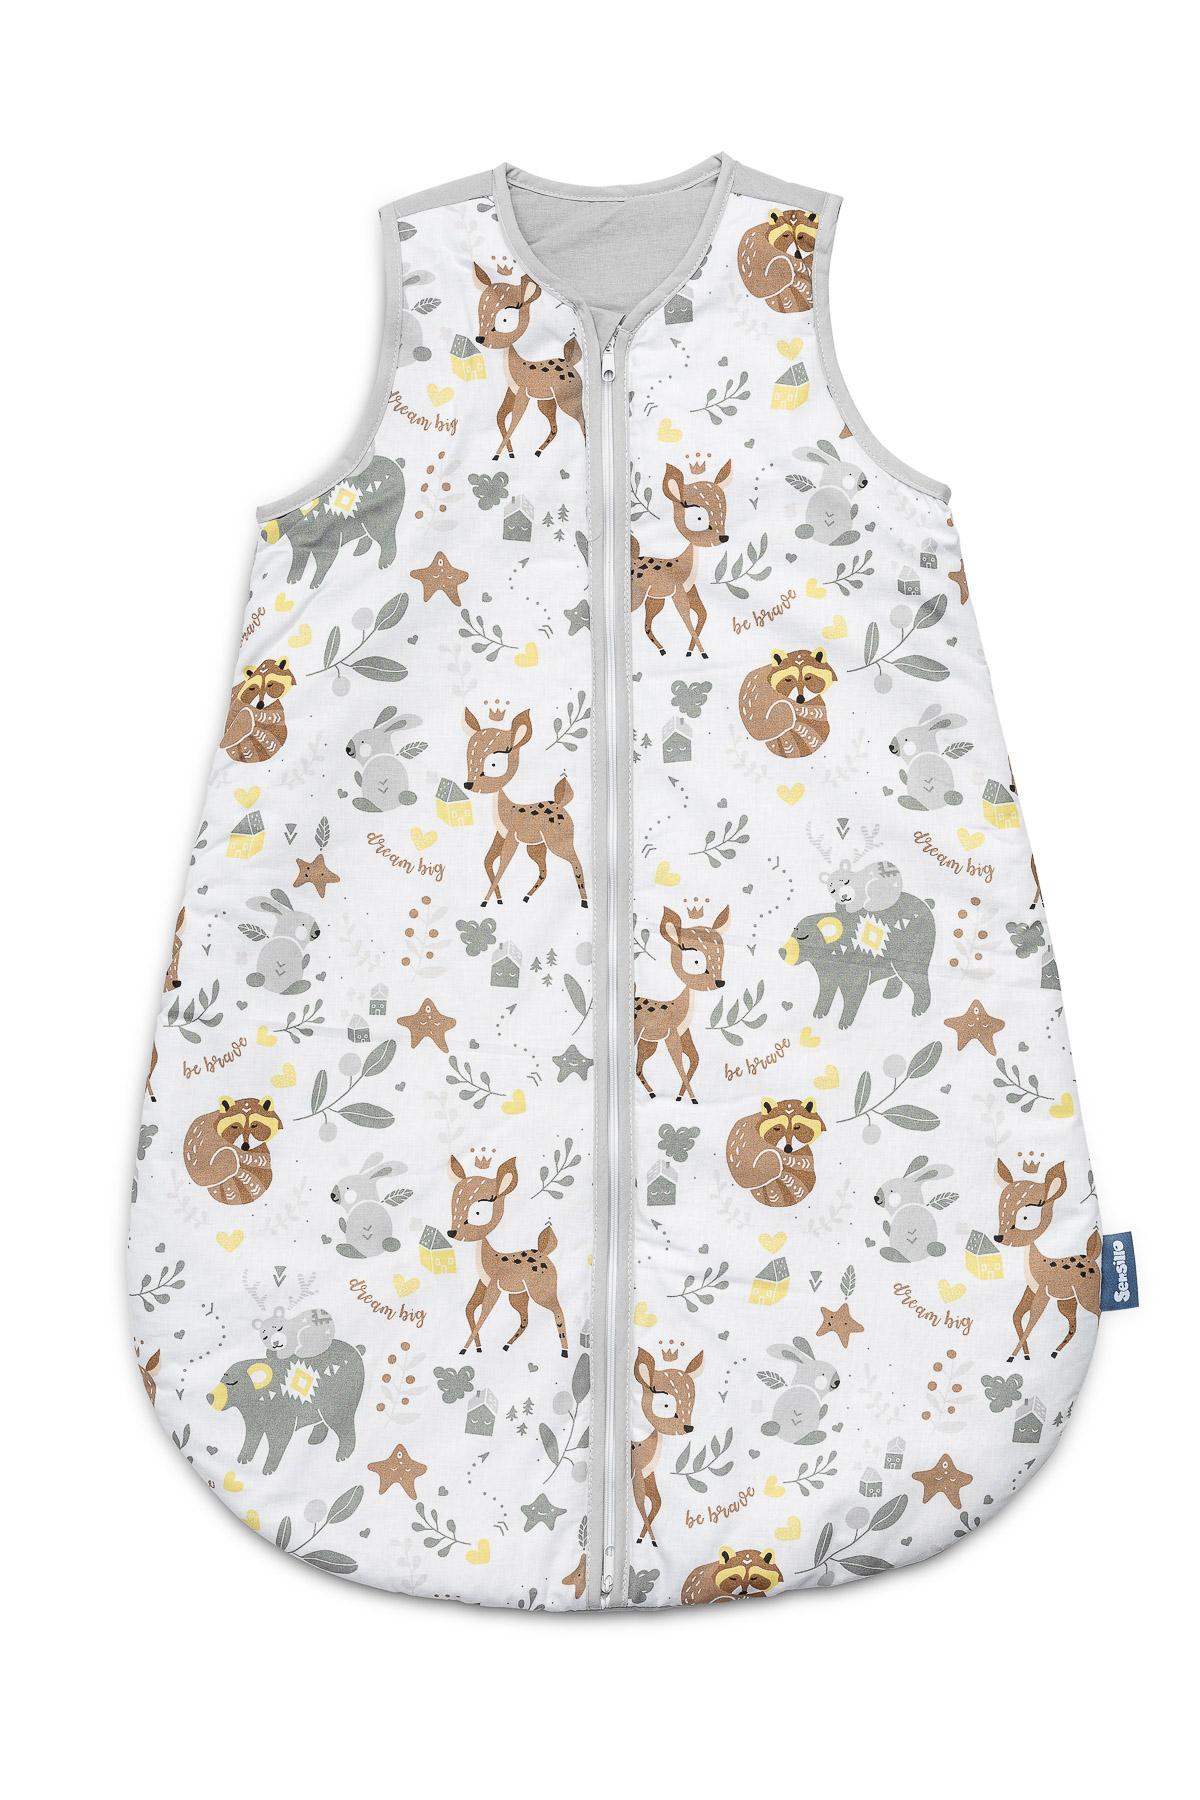 Sleeping bag S – forest adventure